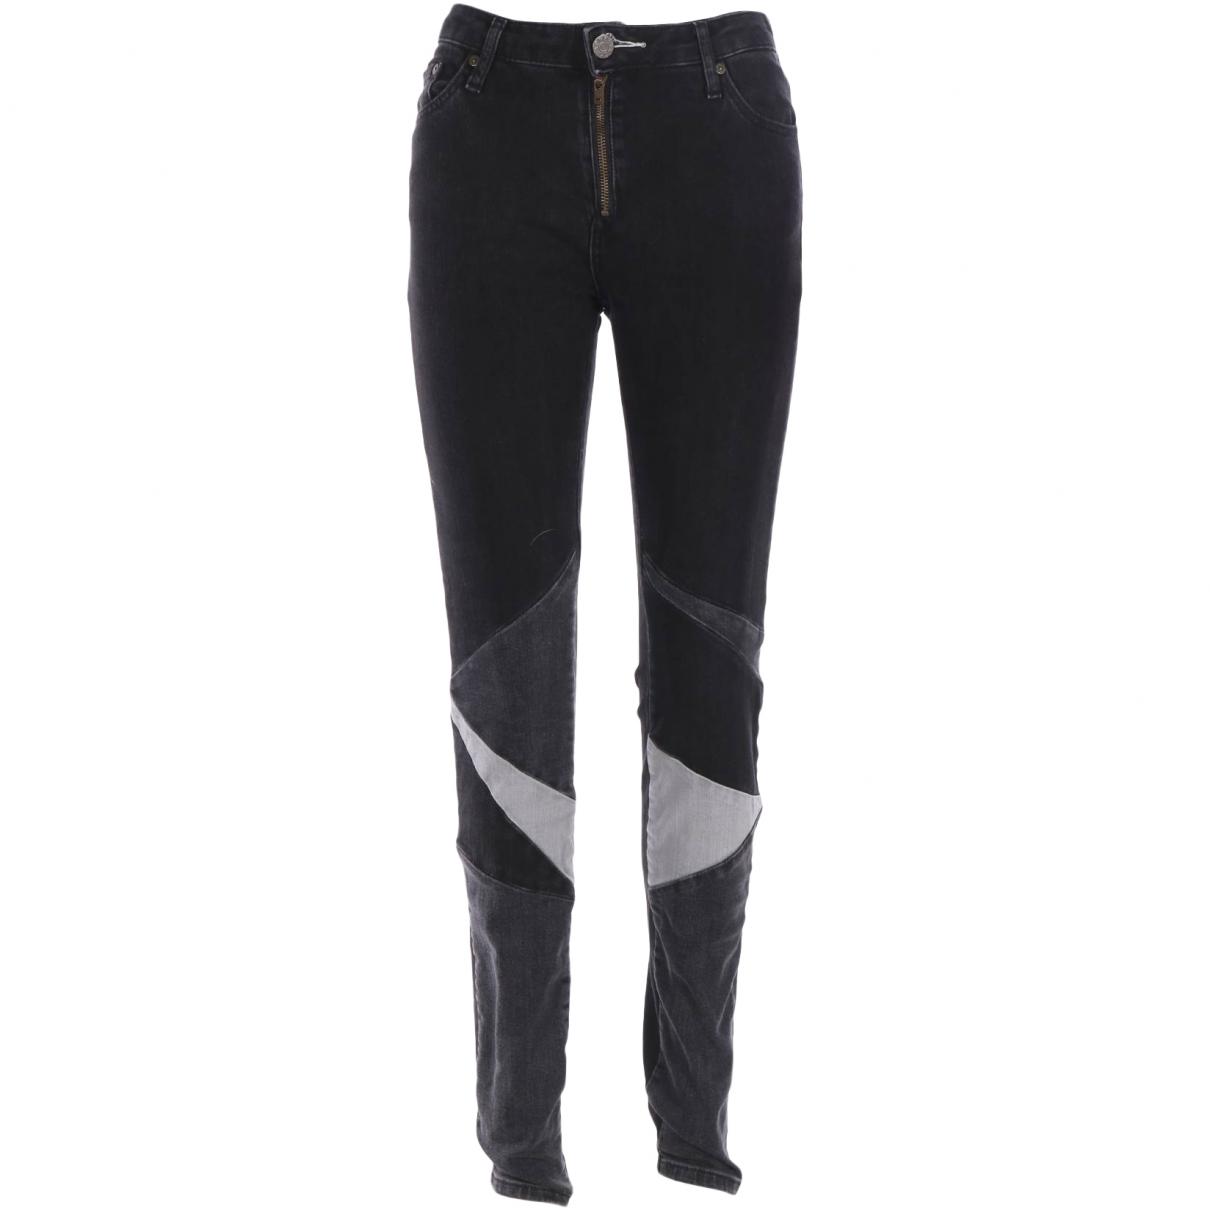 Acne Studios \N Multicolour Cotton - elasthane Jeans for Women 27 US